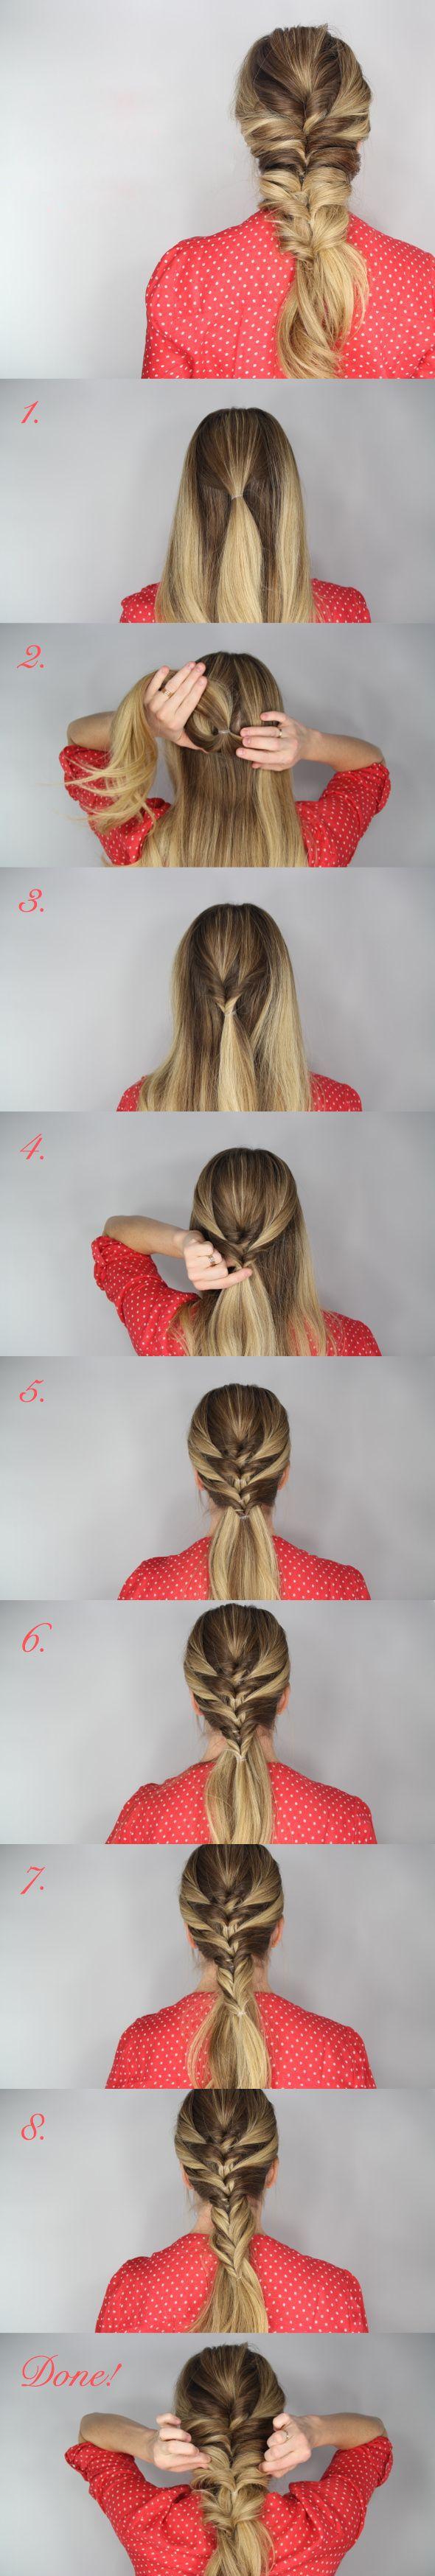 Shortcut to Fishtail Braid | Makeup Mania